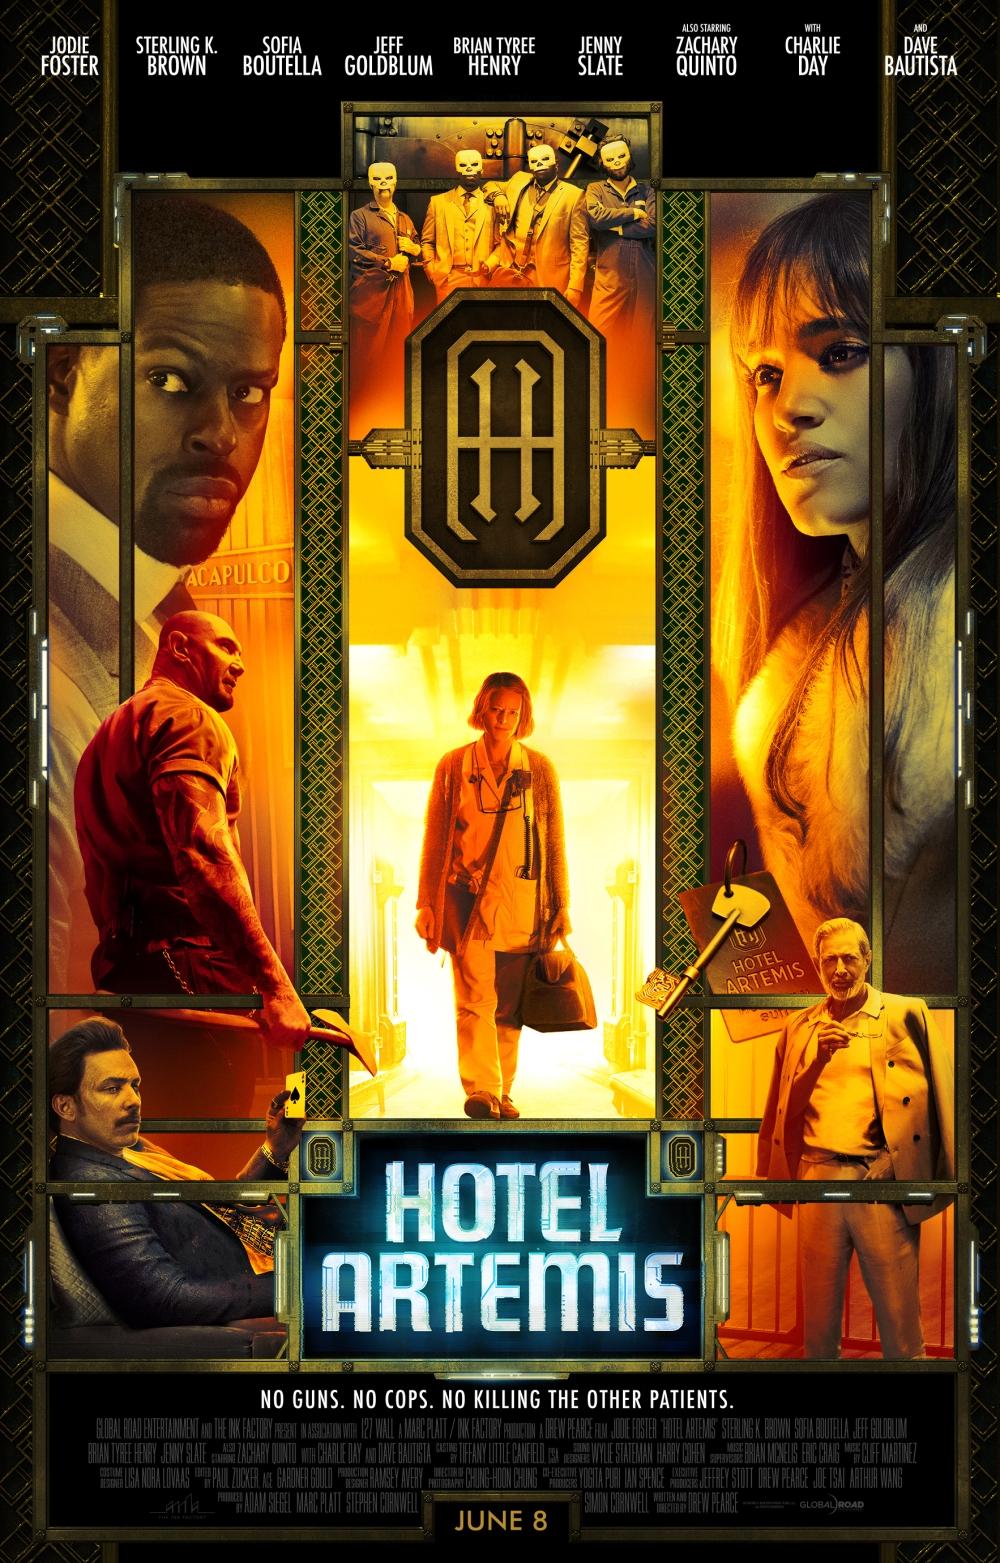 HotelArtemis_Poster